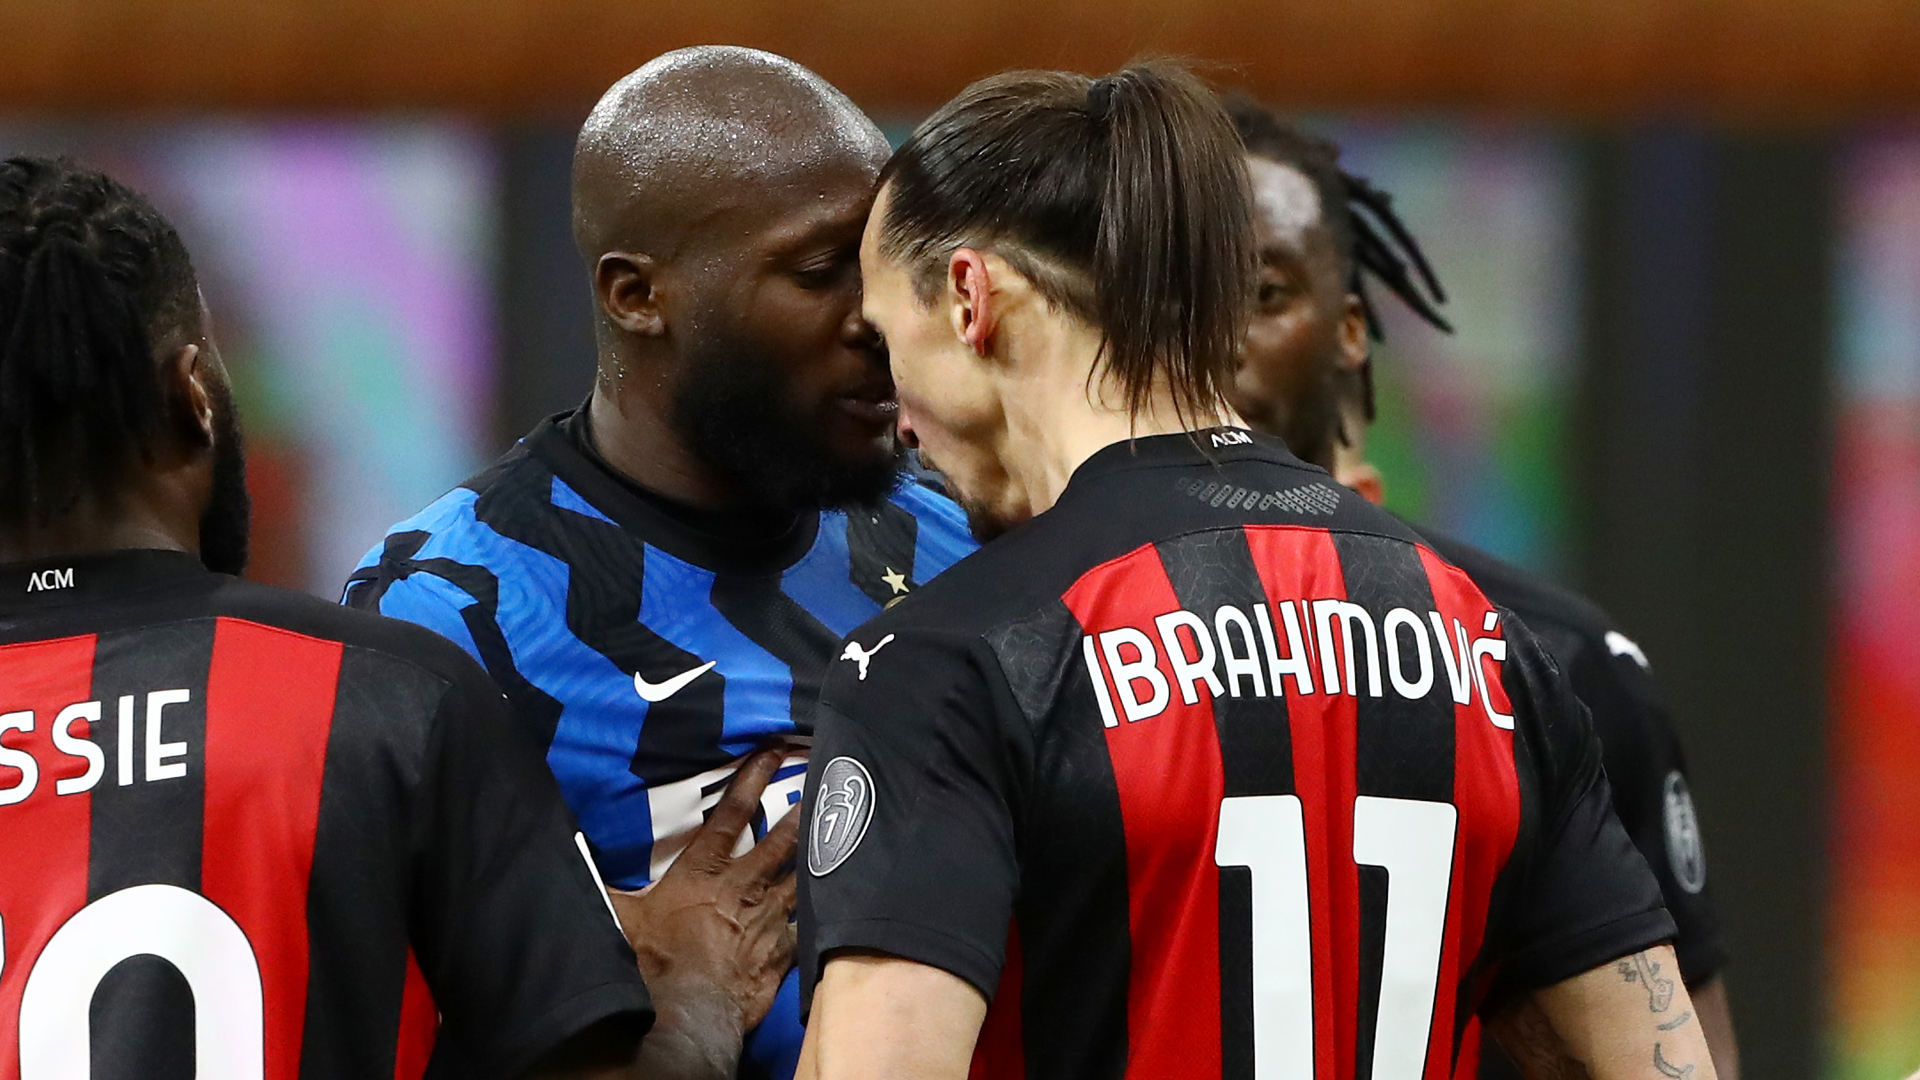 Ibrahimovic denies using racist language in on-field spat with Lukaku in Inter vs AC Milan derby clash